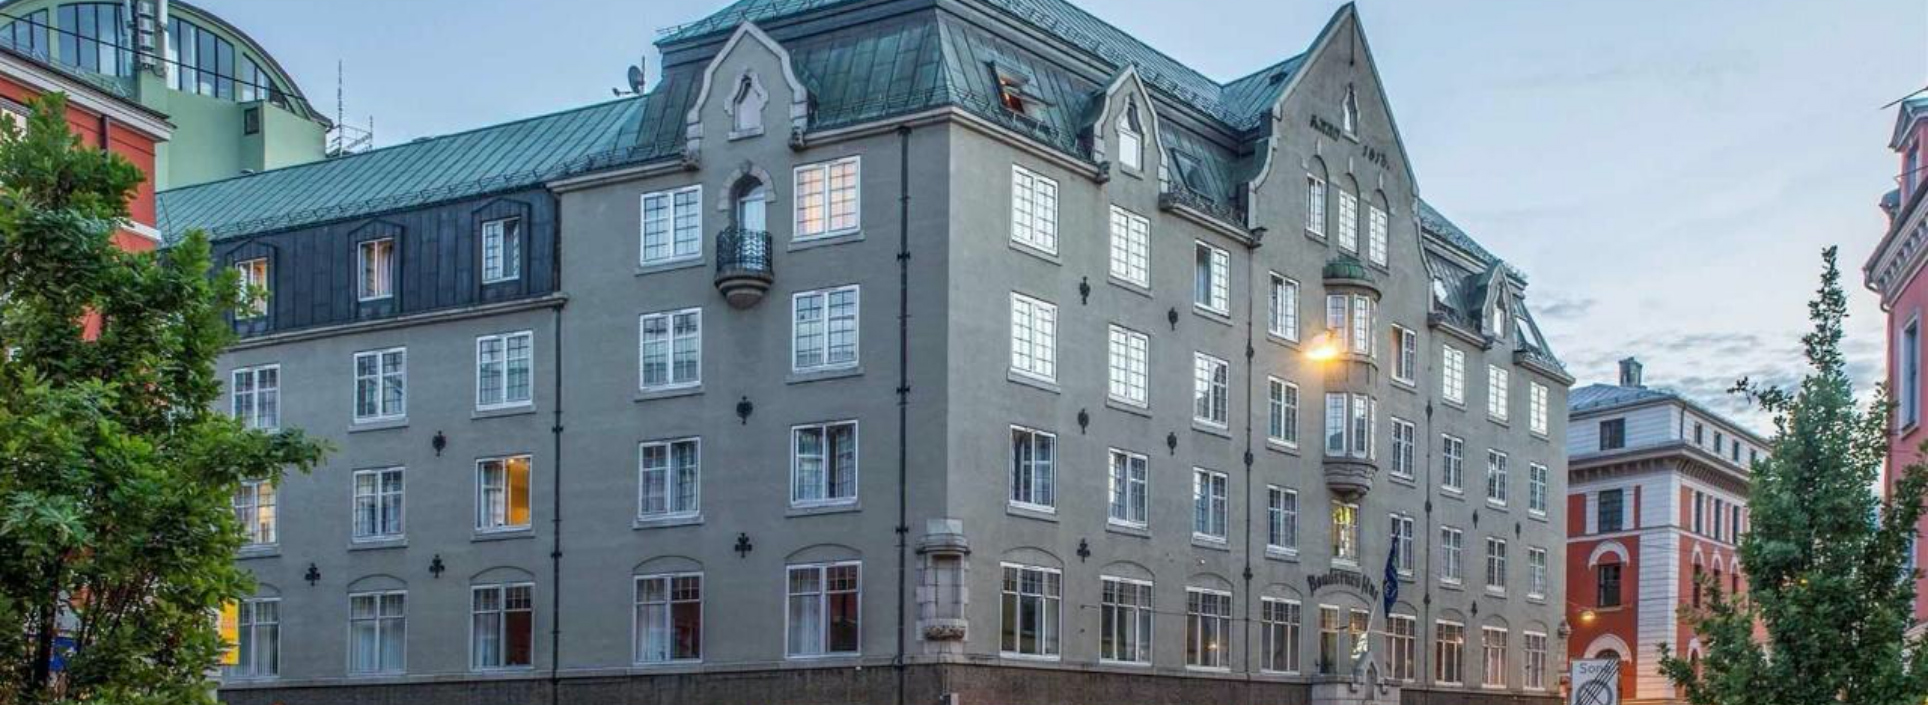 Hotell Bondeheimen fasade